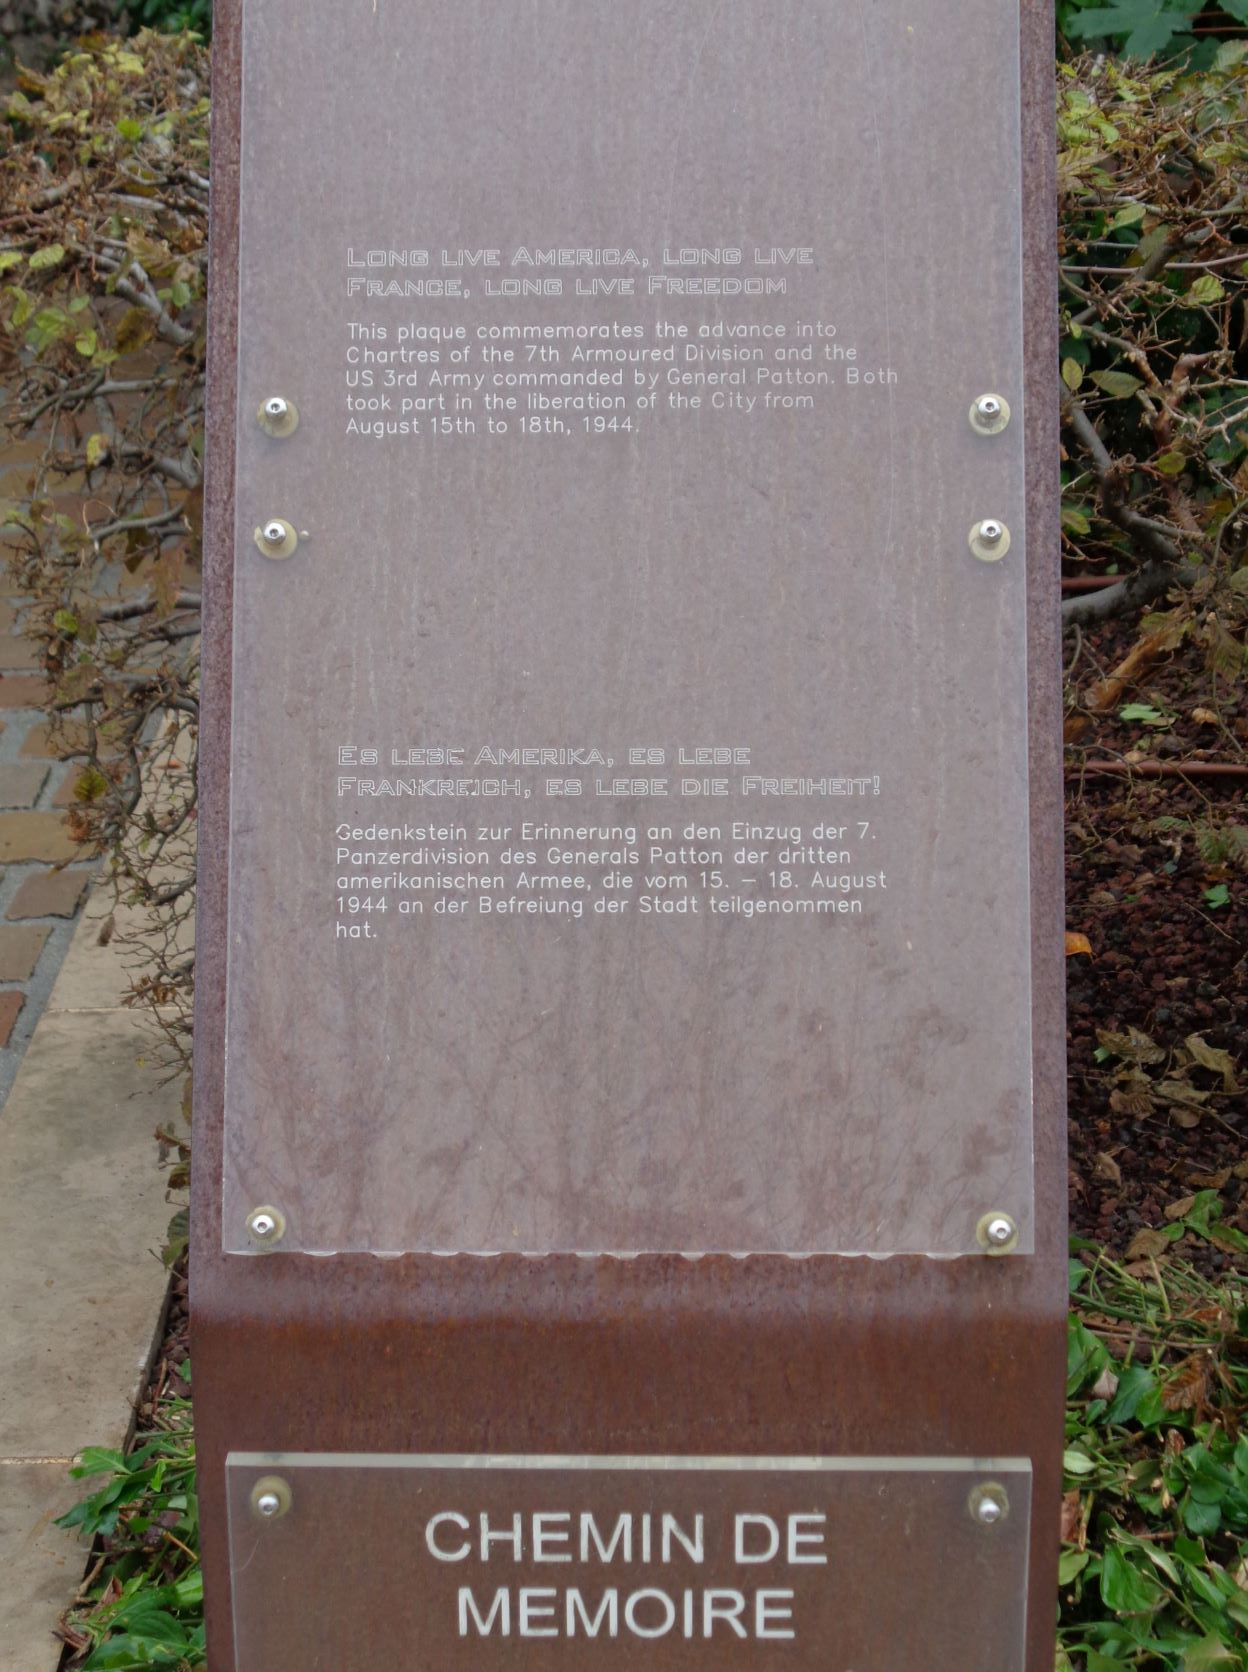 Chartres chemin de memoire Gen Patton 3rd army 7th armor div liberated sep21